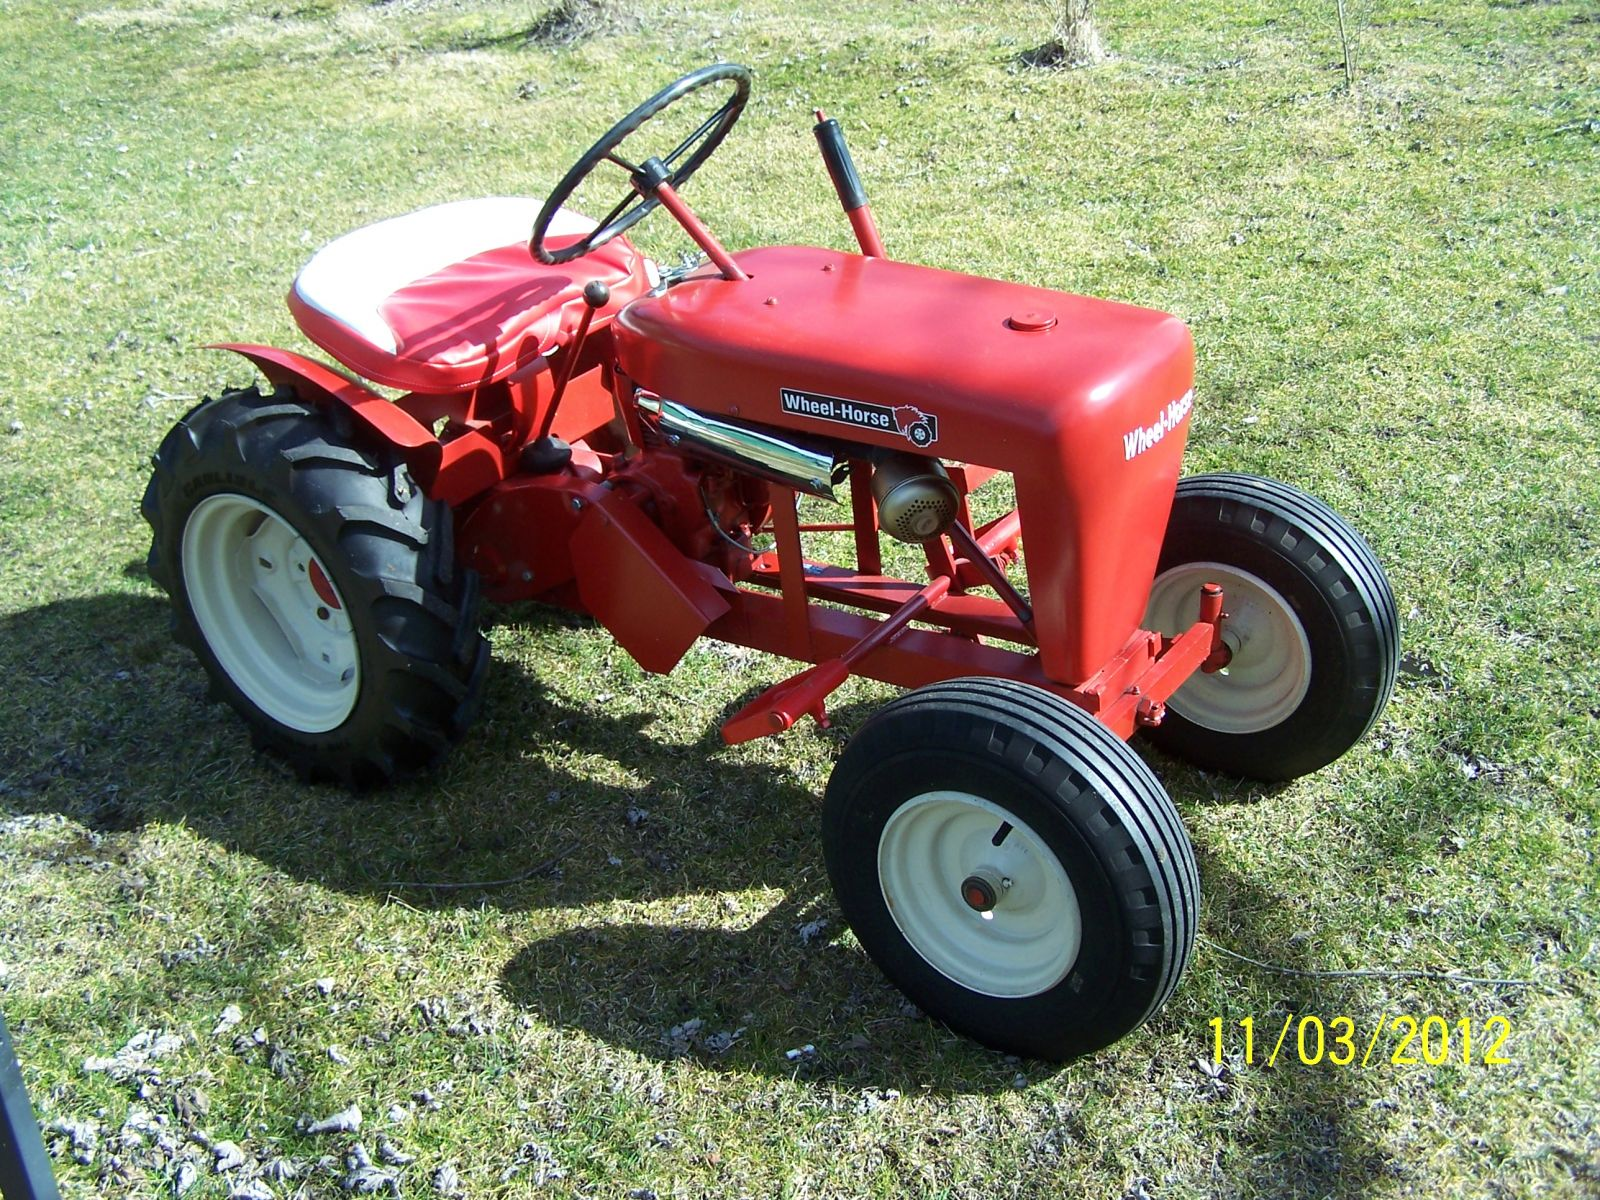 1958 Wheel Horse RJ